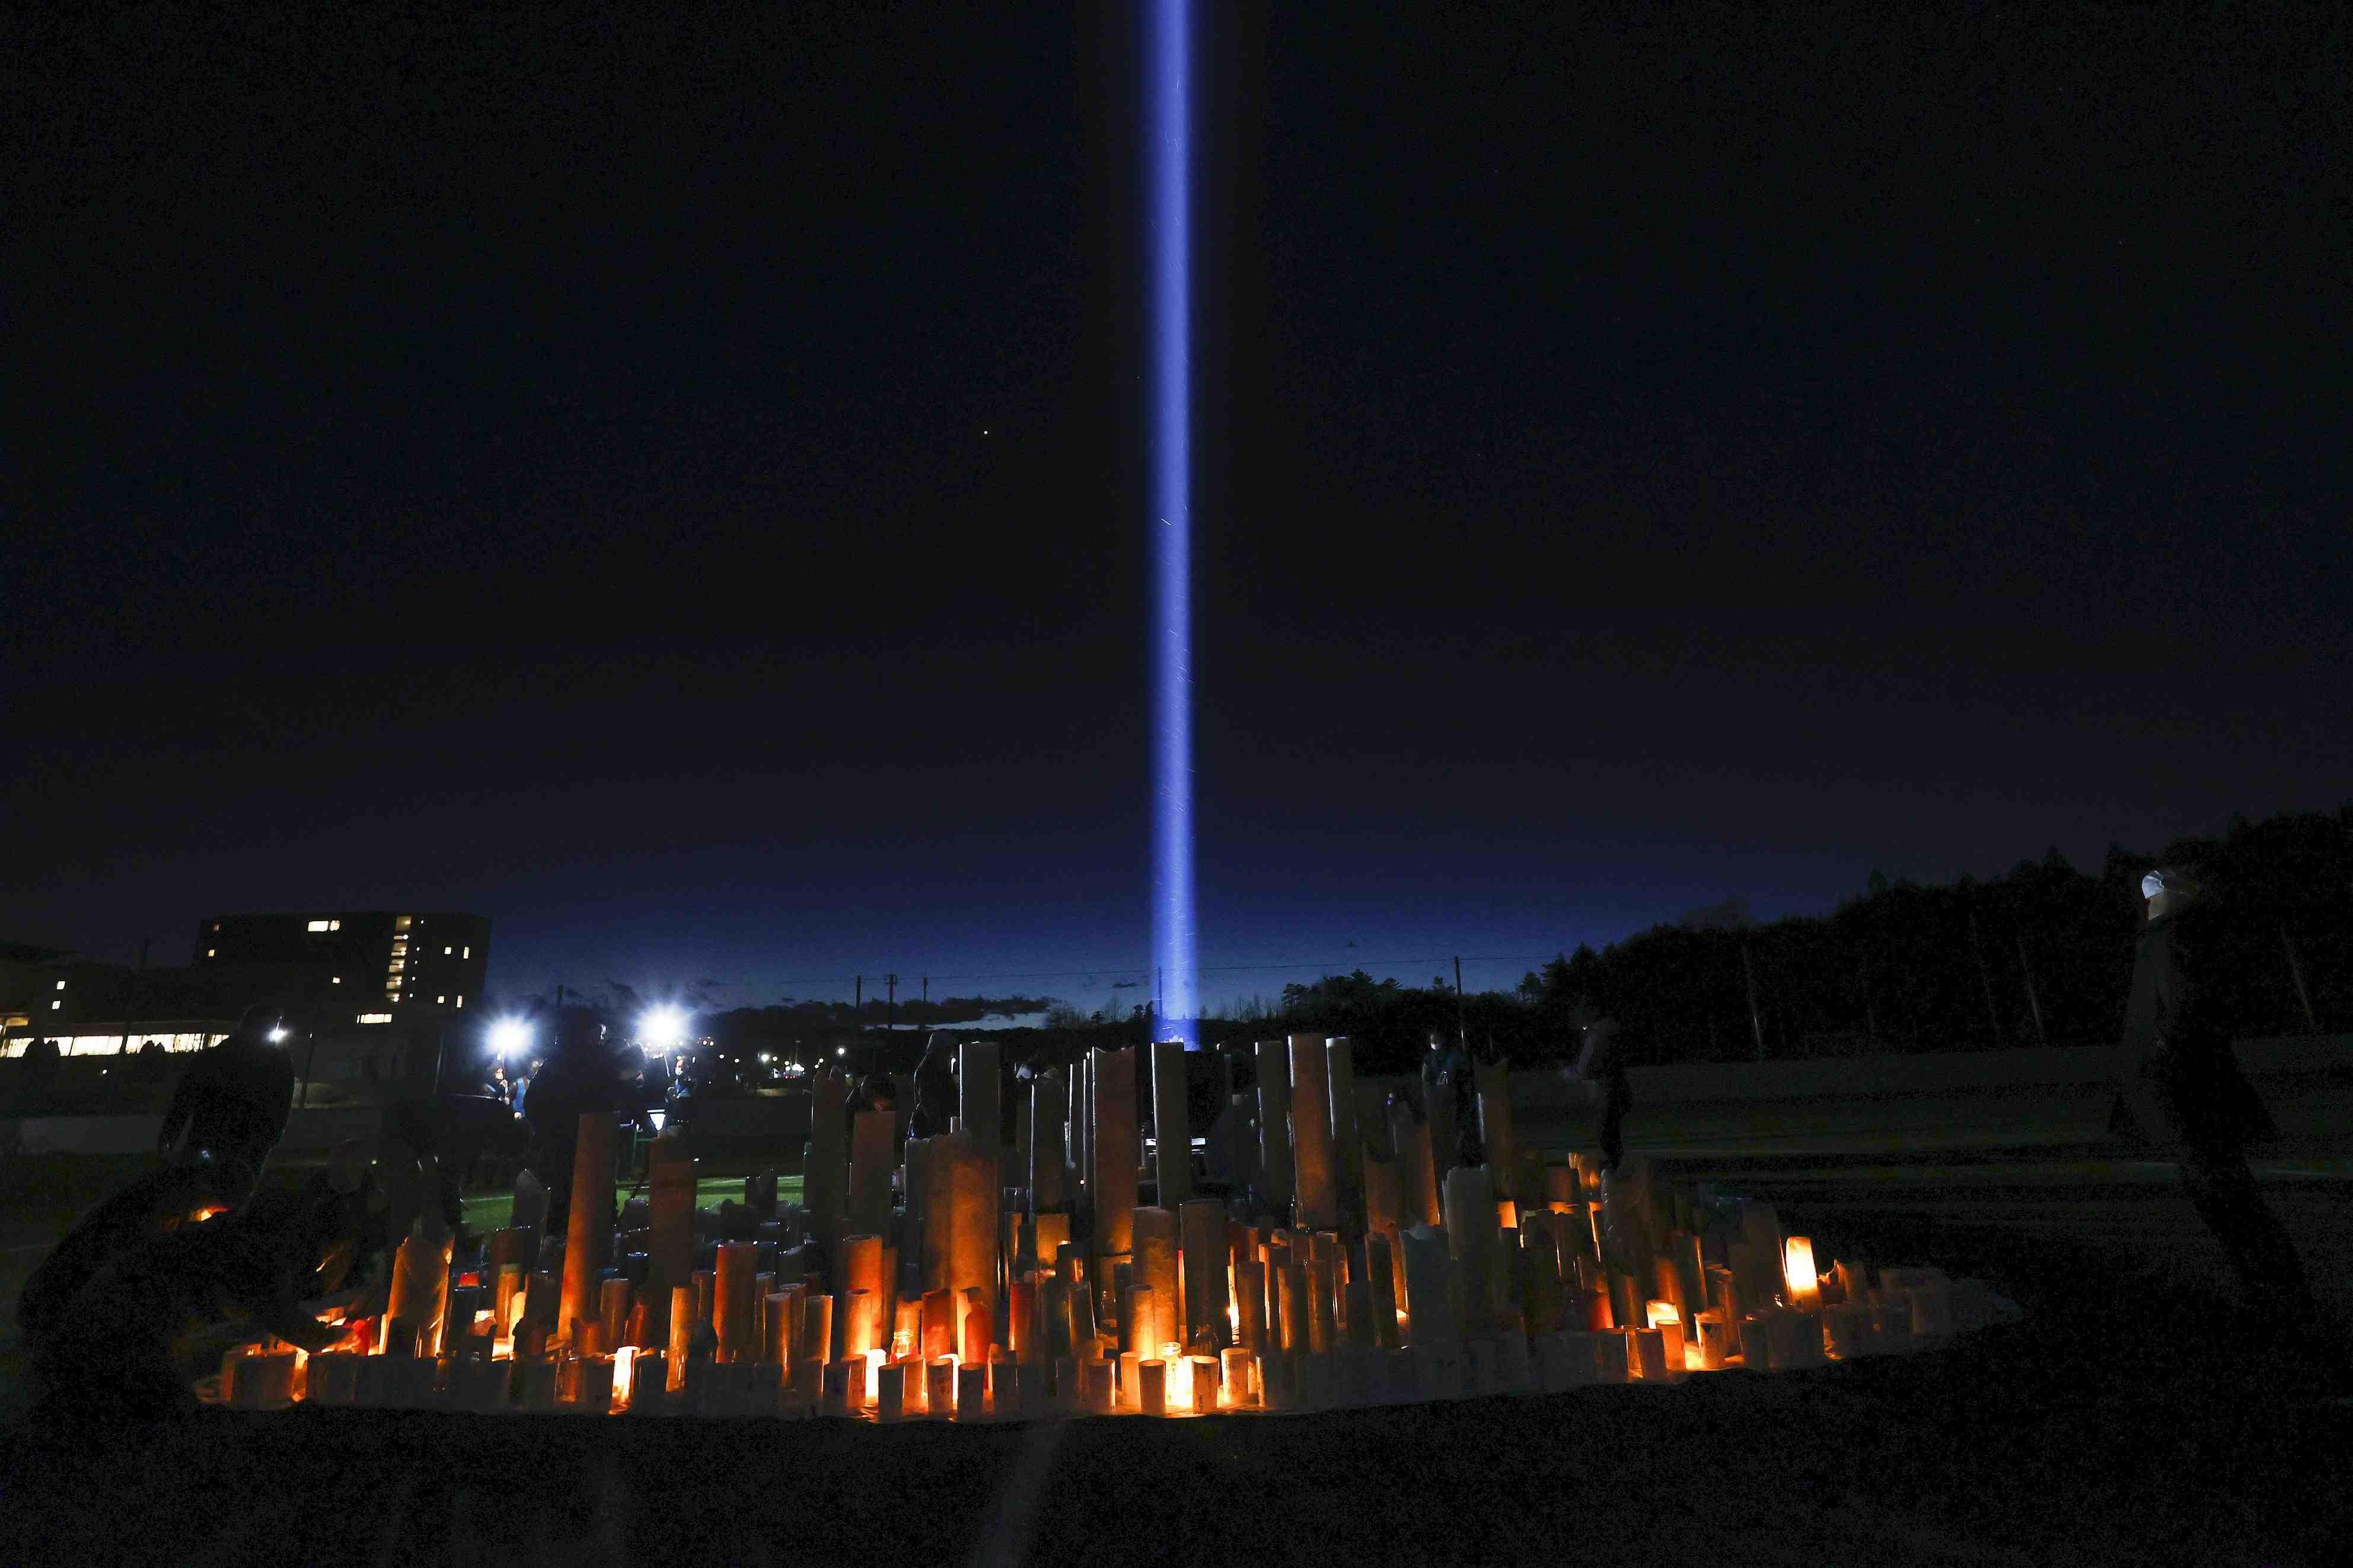 Japan 3.11 Anniversary The Great Tohoku Earthquake 020